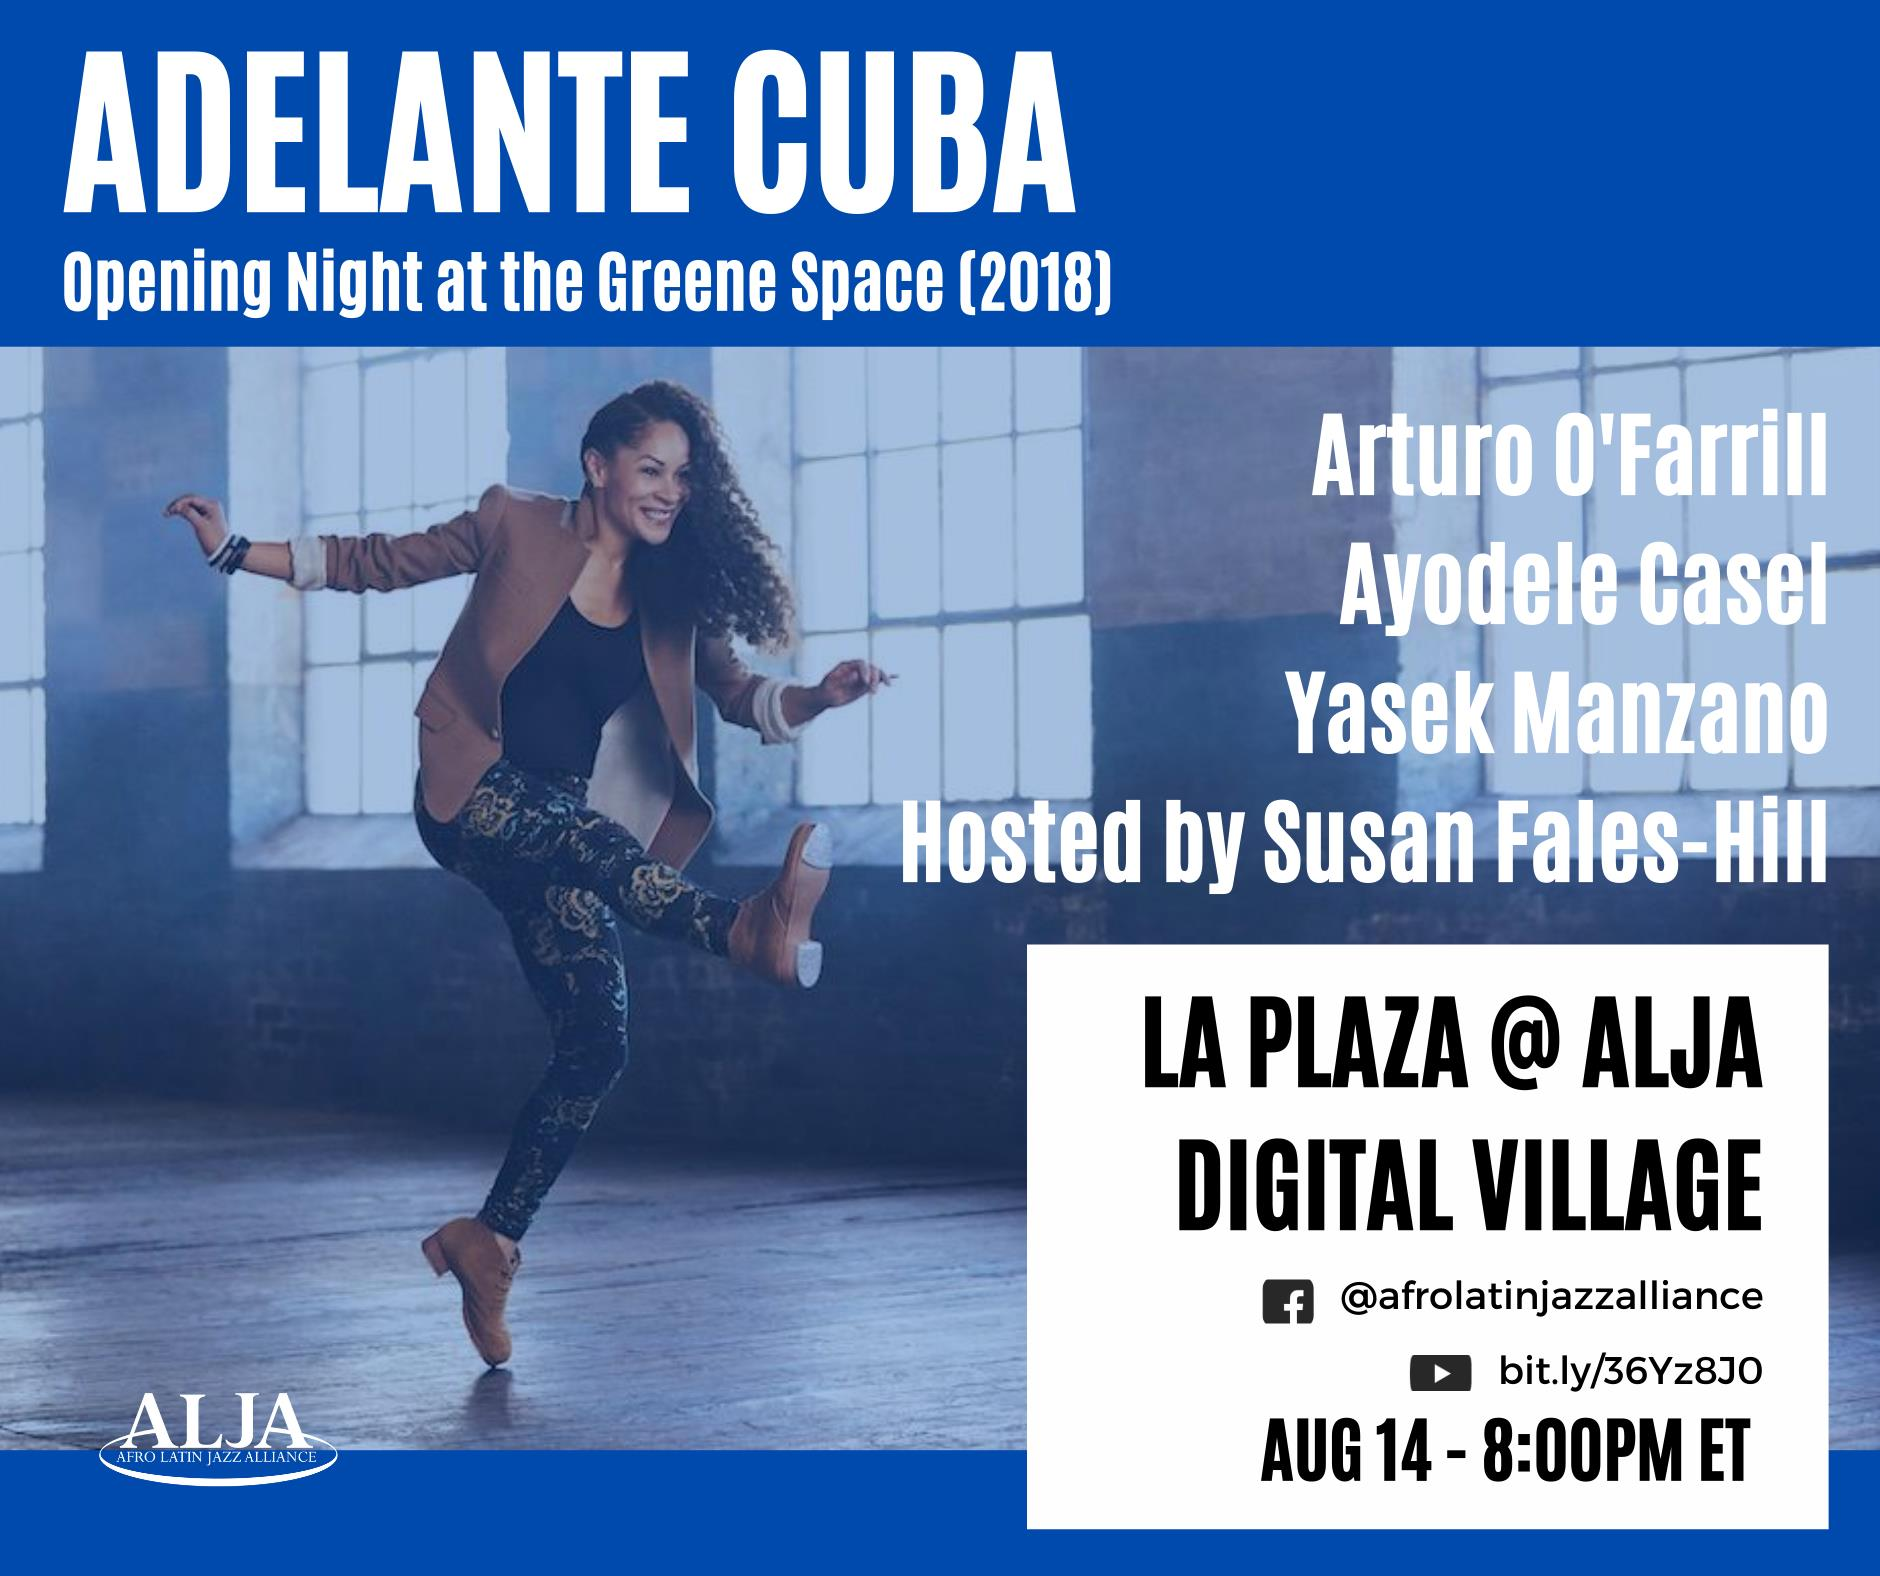 La Plaza @ Digital VillageAdelante, Cuba!Ayodele Casel + Yasek Manzano + Susan Fales-Hill + Arturo O'FarrillFri., Aug. 14 @ 8:00 pm EST